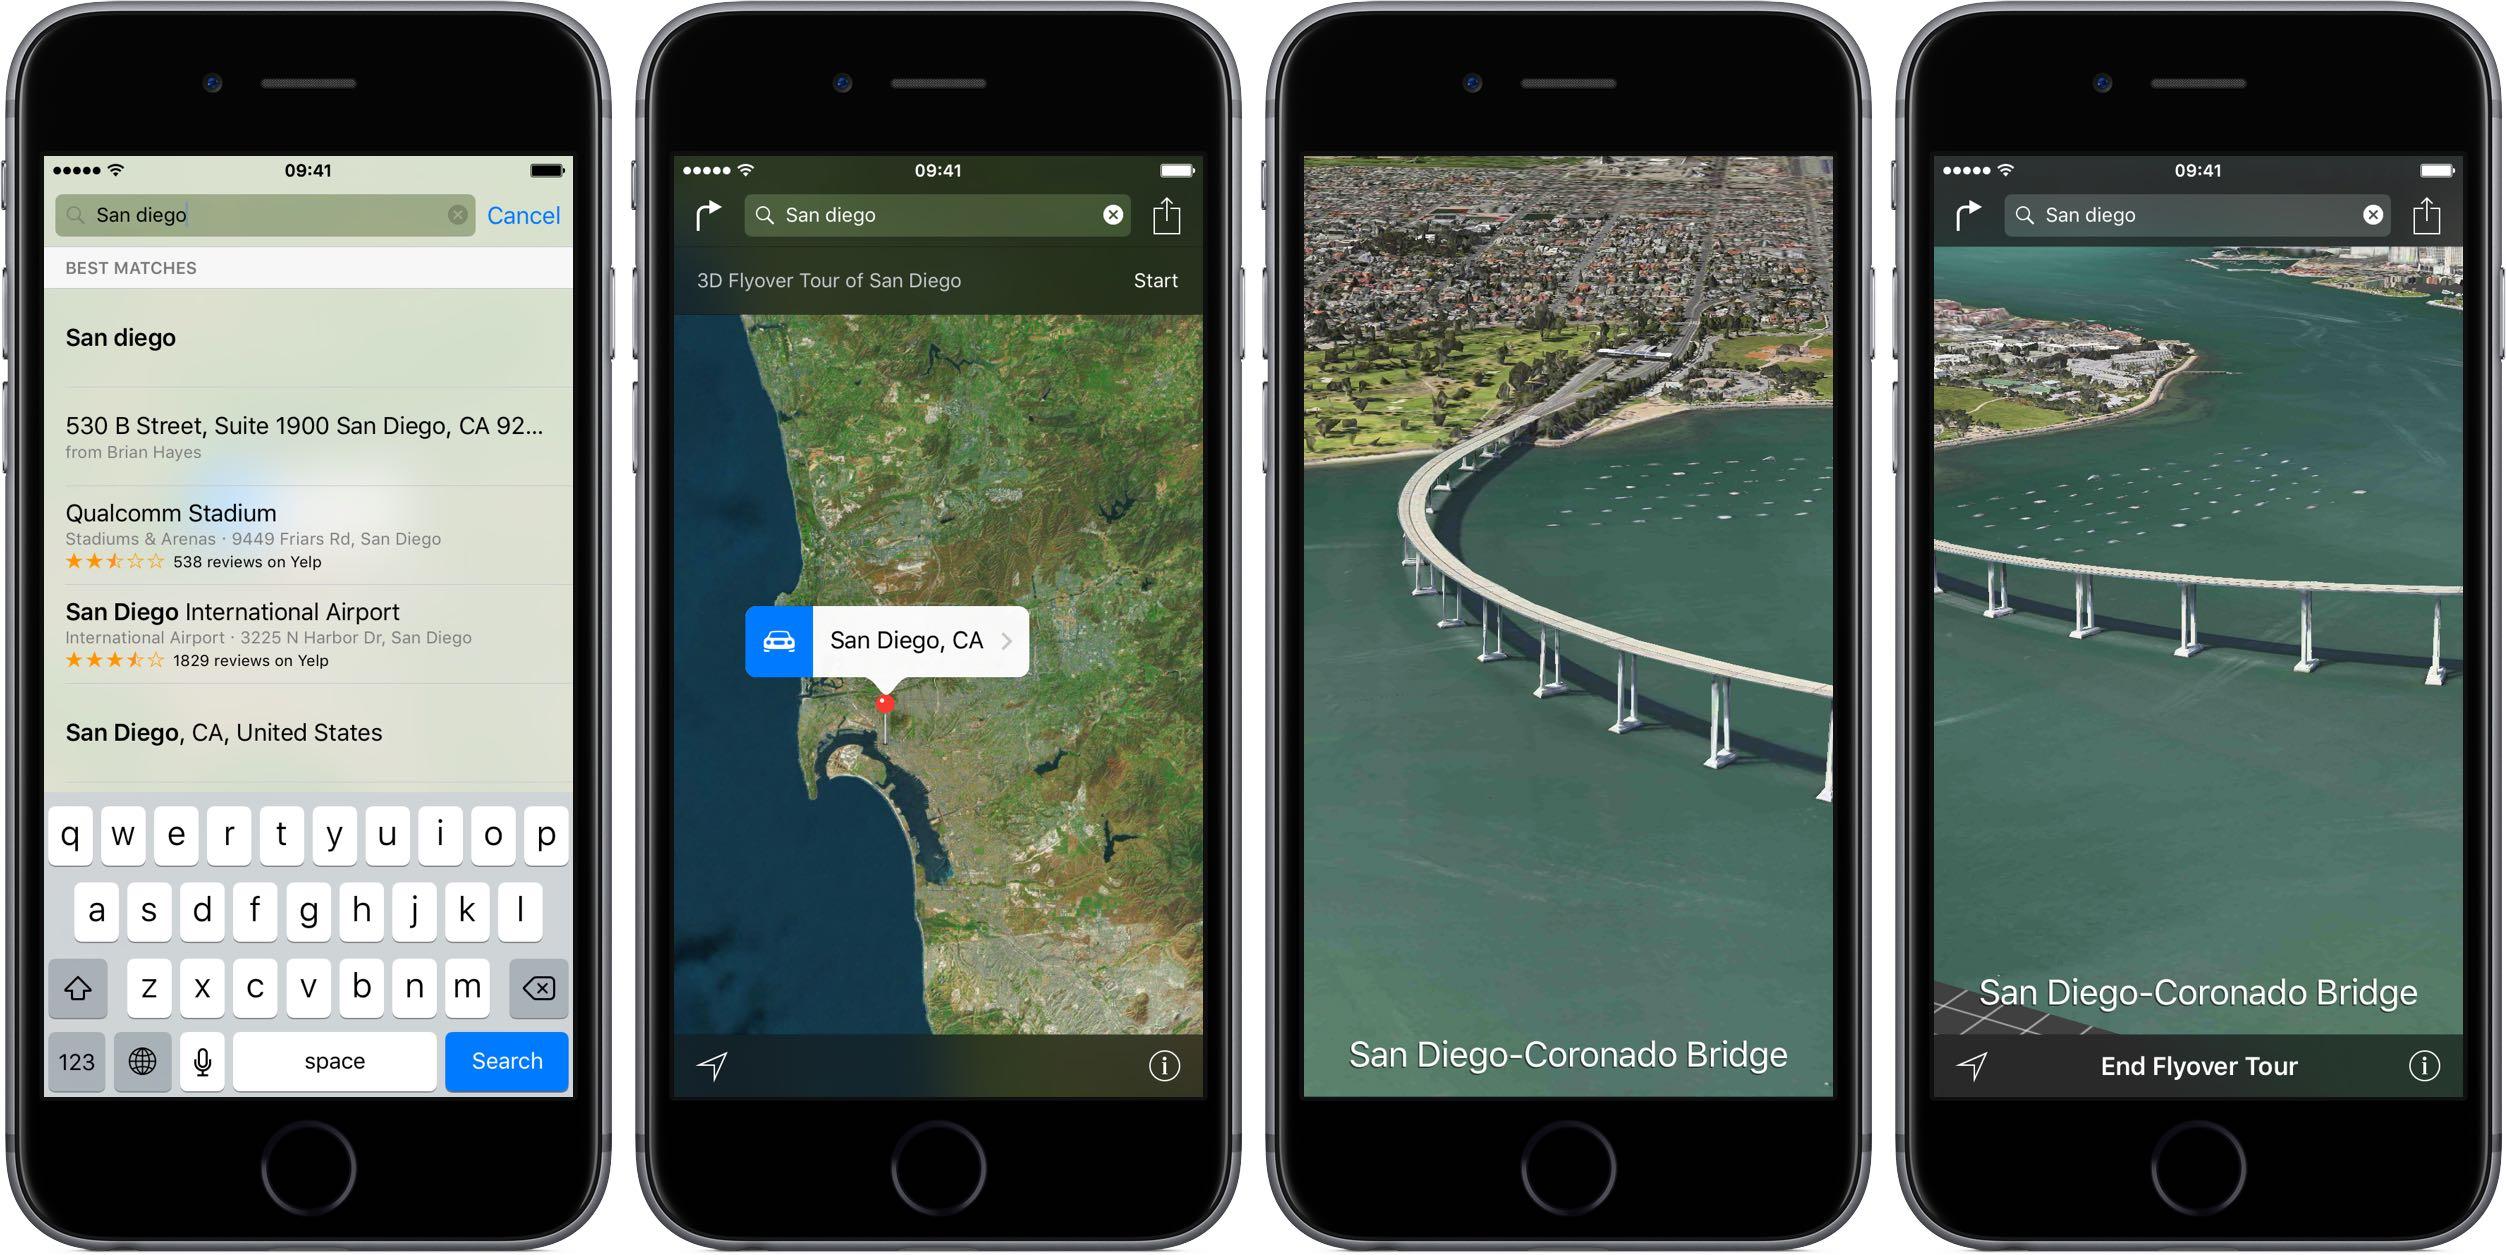 iOS 9 Apple Maps 3D Flyover Tour San Diego iPhone screenshot 001